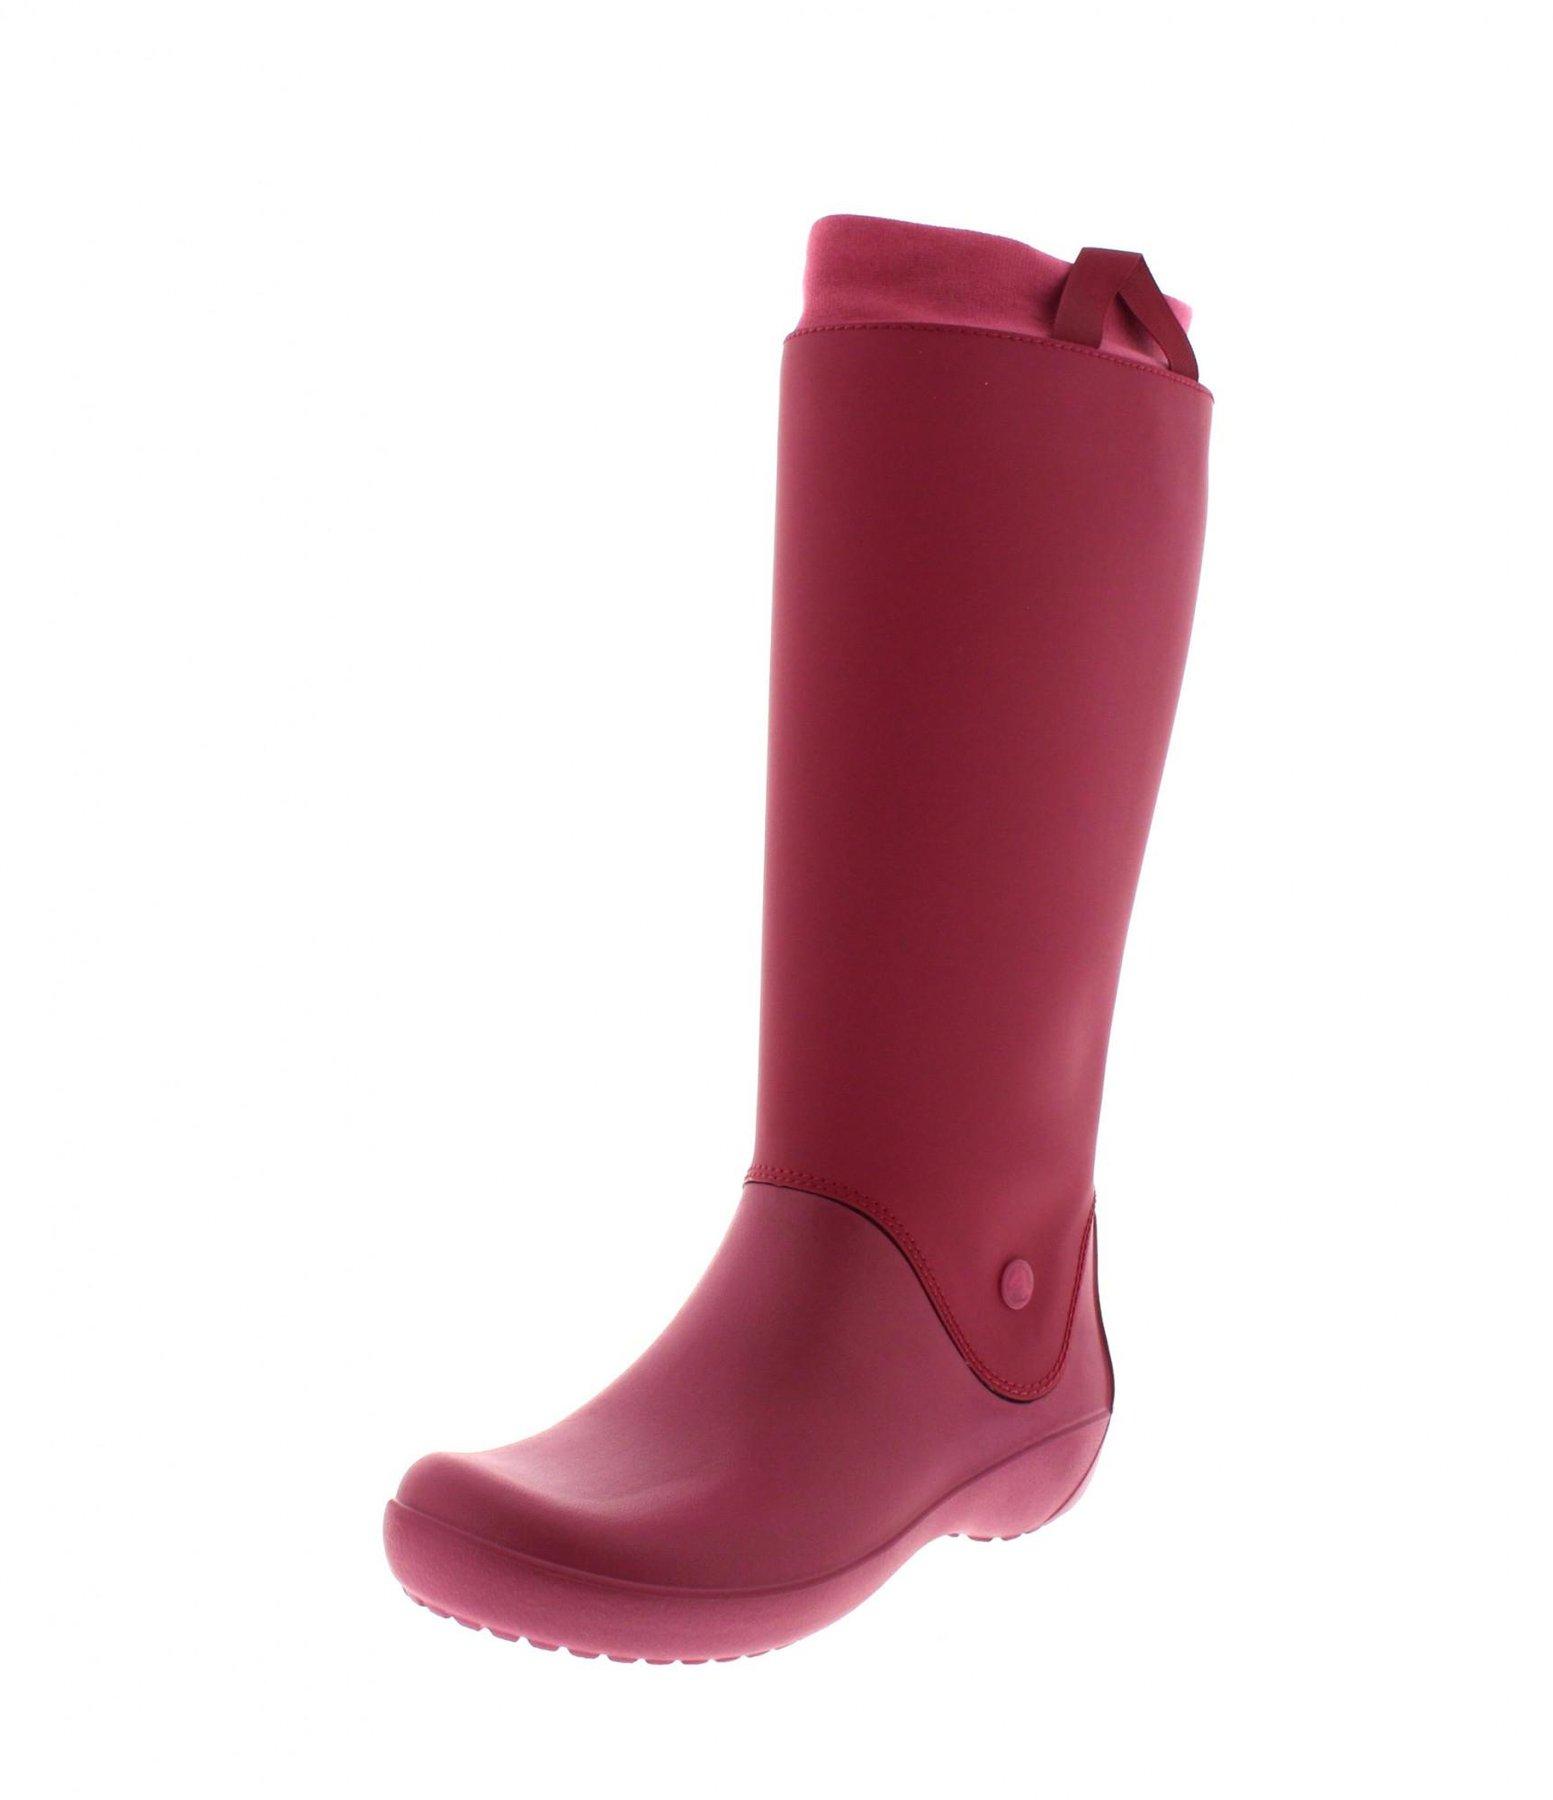 Crocs Women's RainFloe Boot